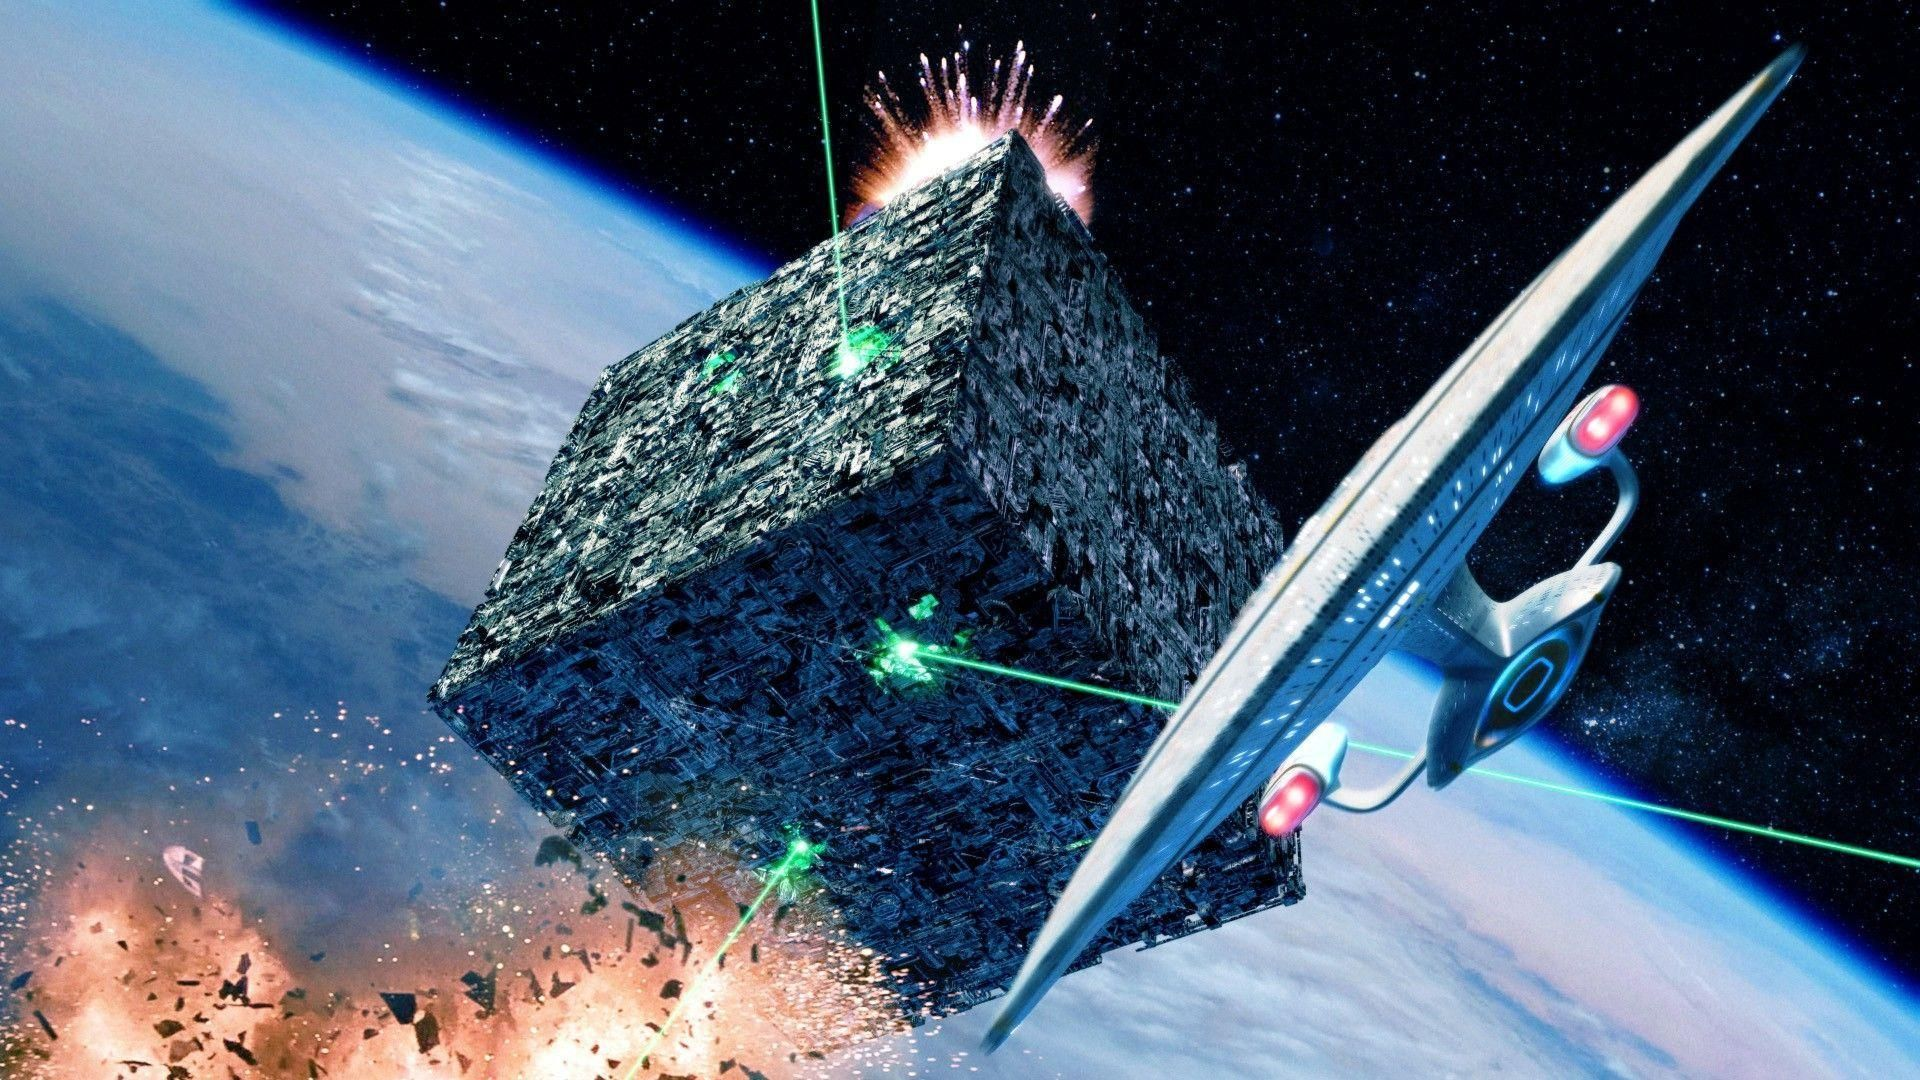 Star Trek HD Desktop Wallpapers for Star trek wallpaper